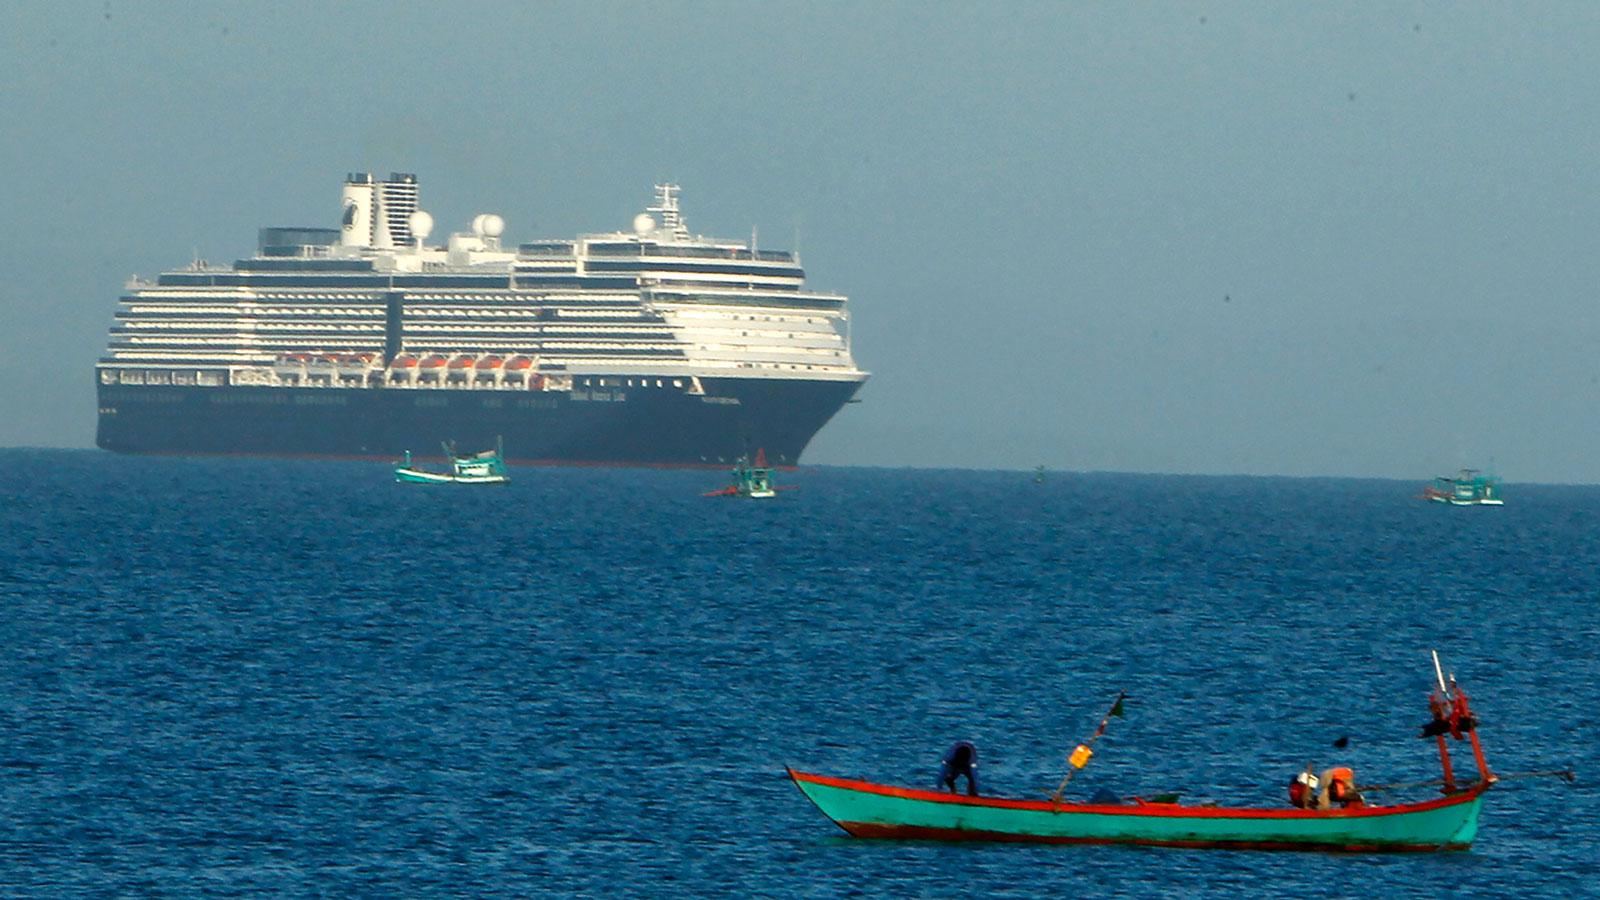 The MS Westerdam sails off Sihanoukville, Cambodia, on Thursday, February 13, 2020.